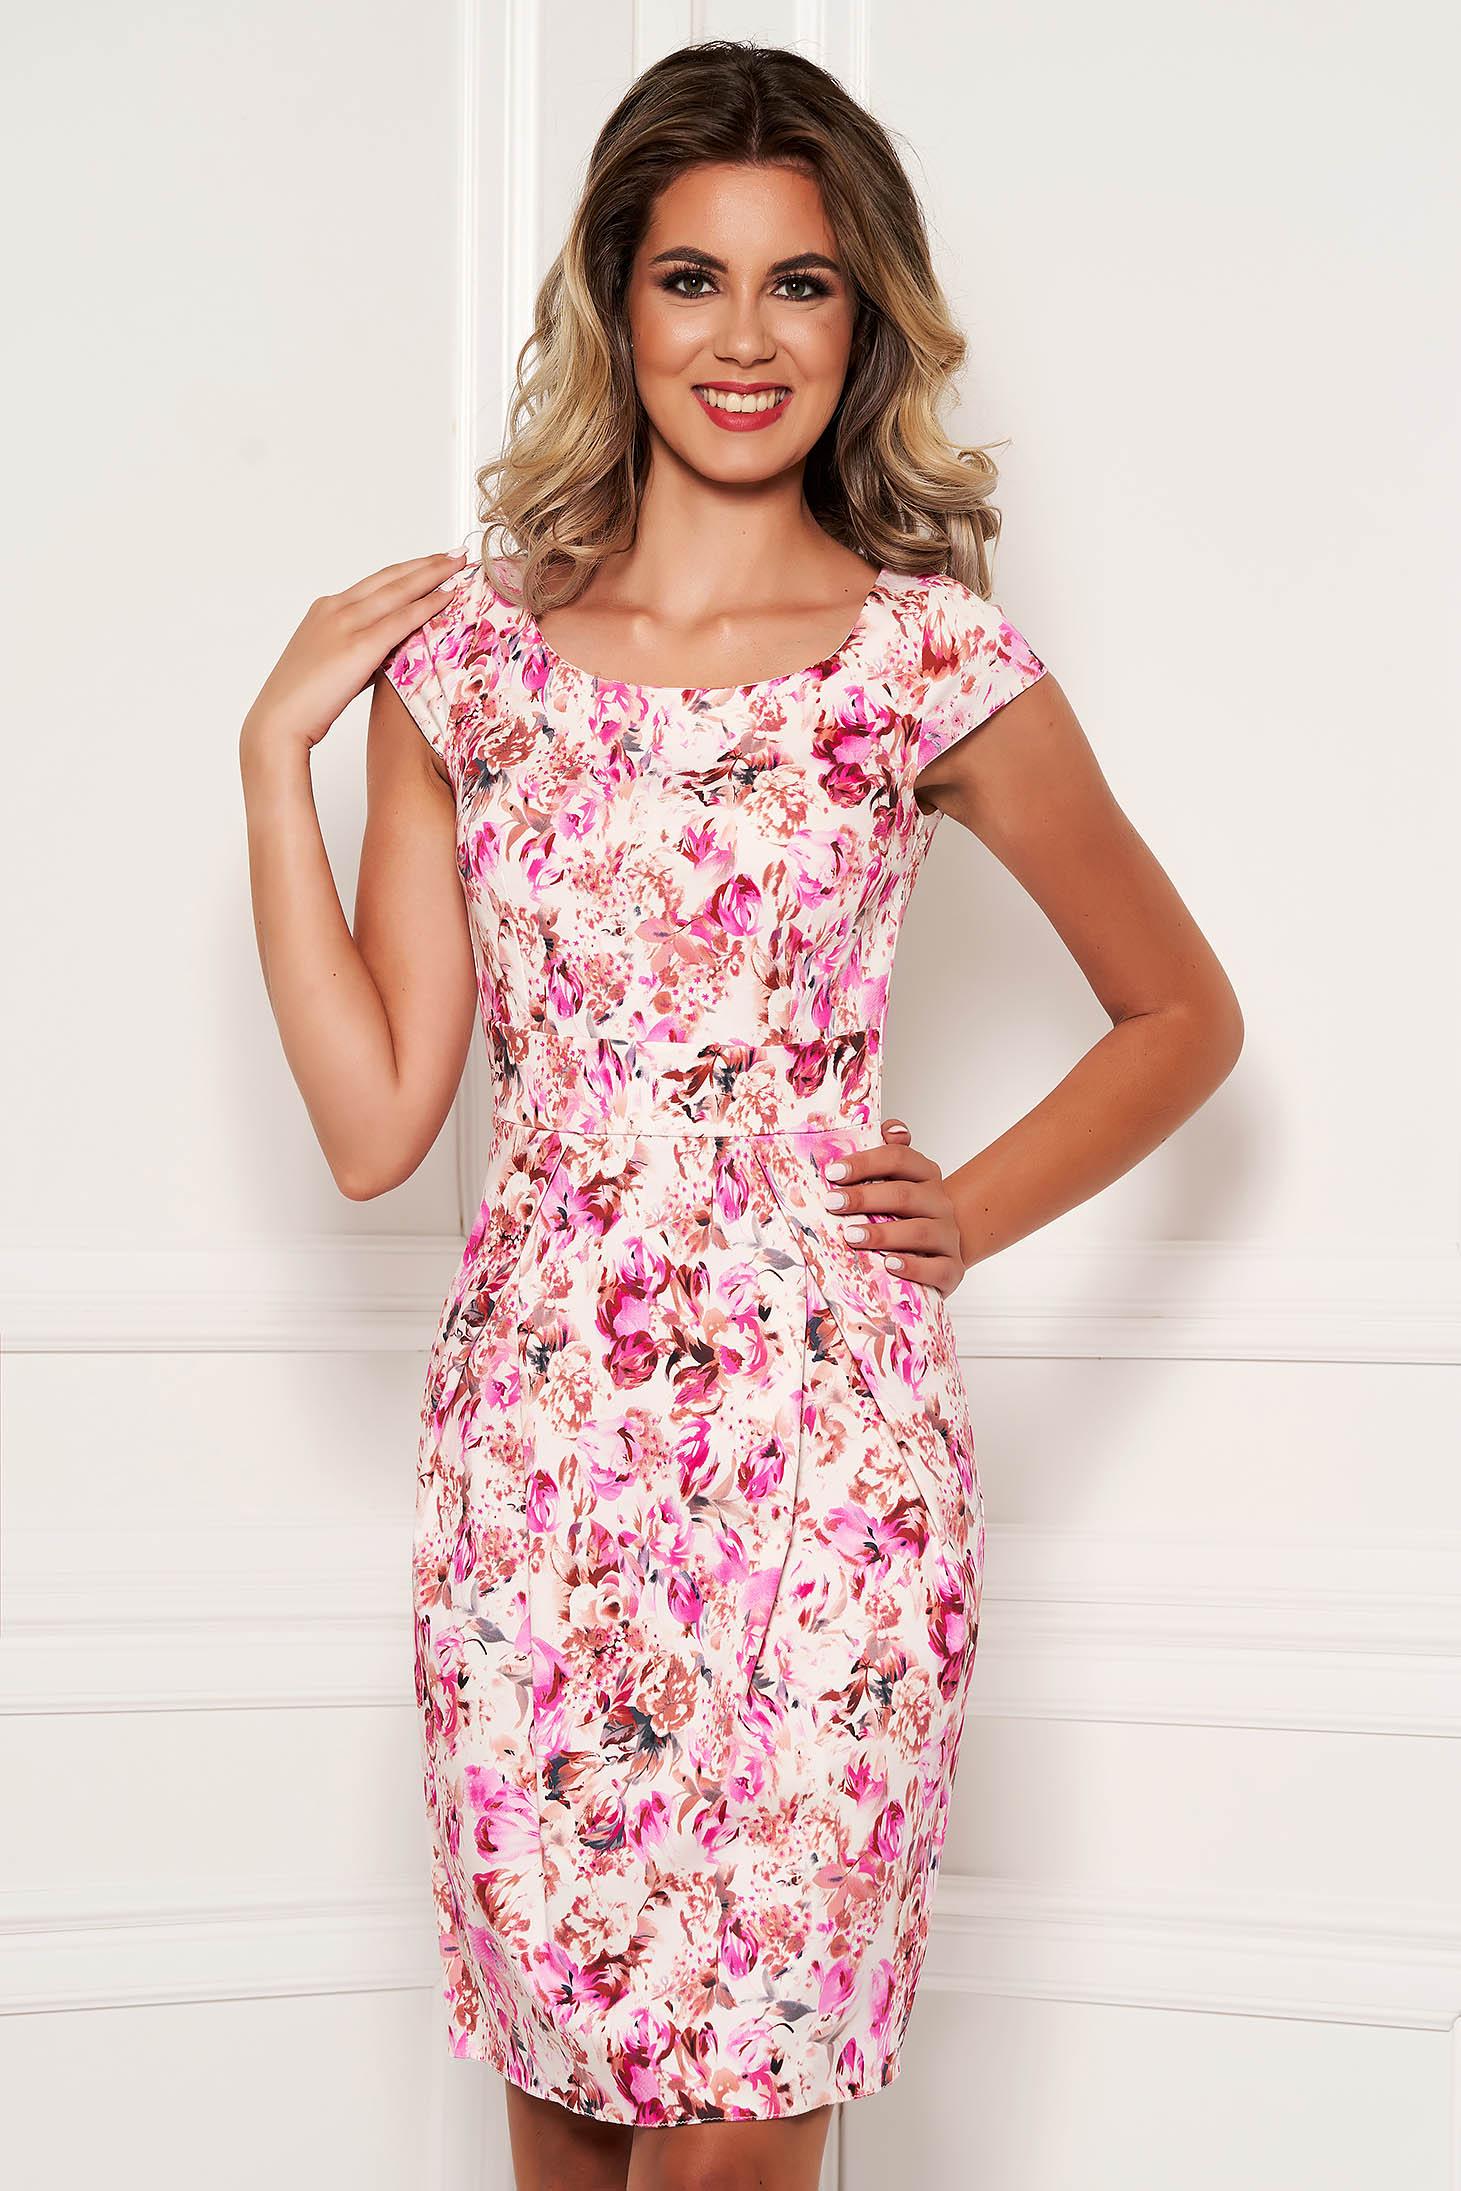 Rochie roz eleganta midi tip creion din bumbac cu maneca scurta si imprimeuri florale